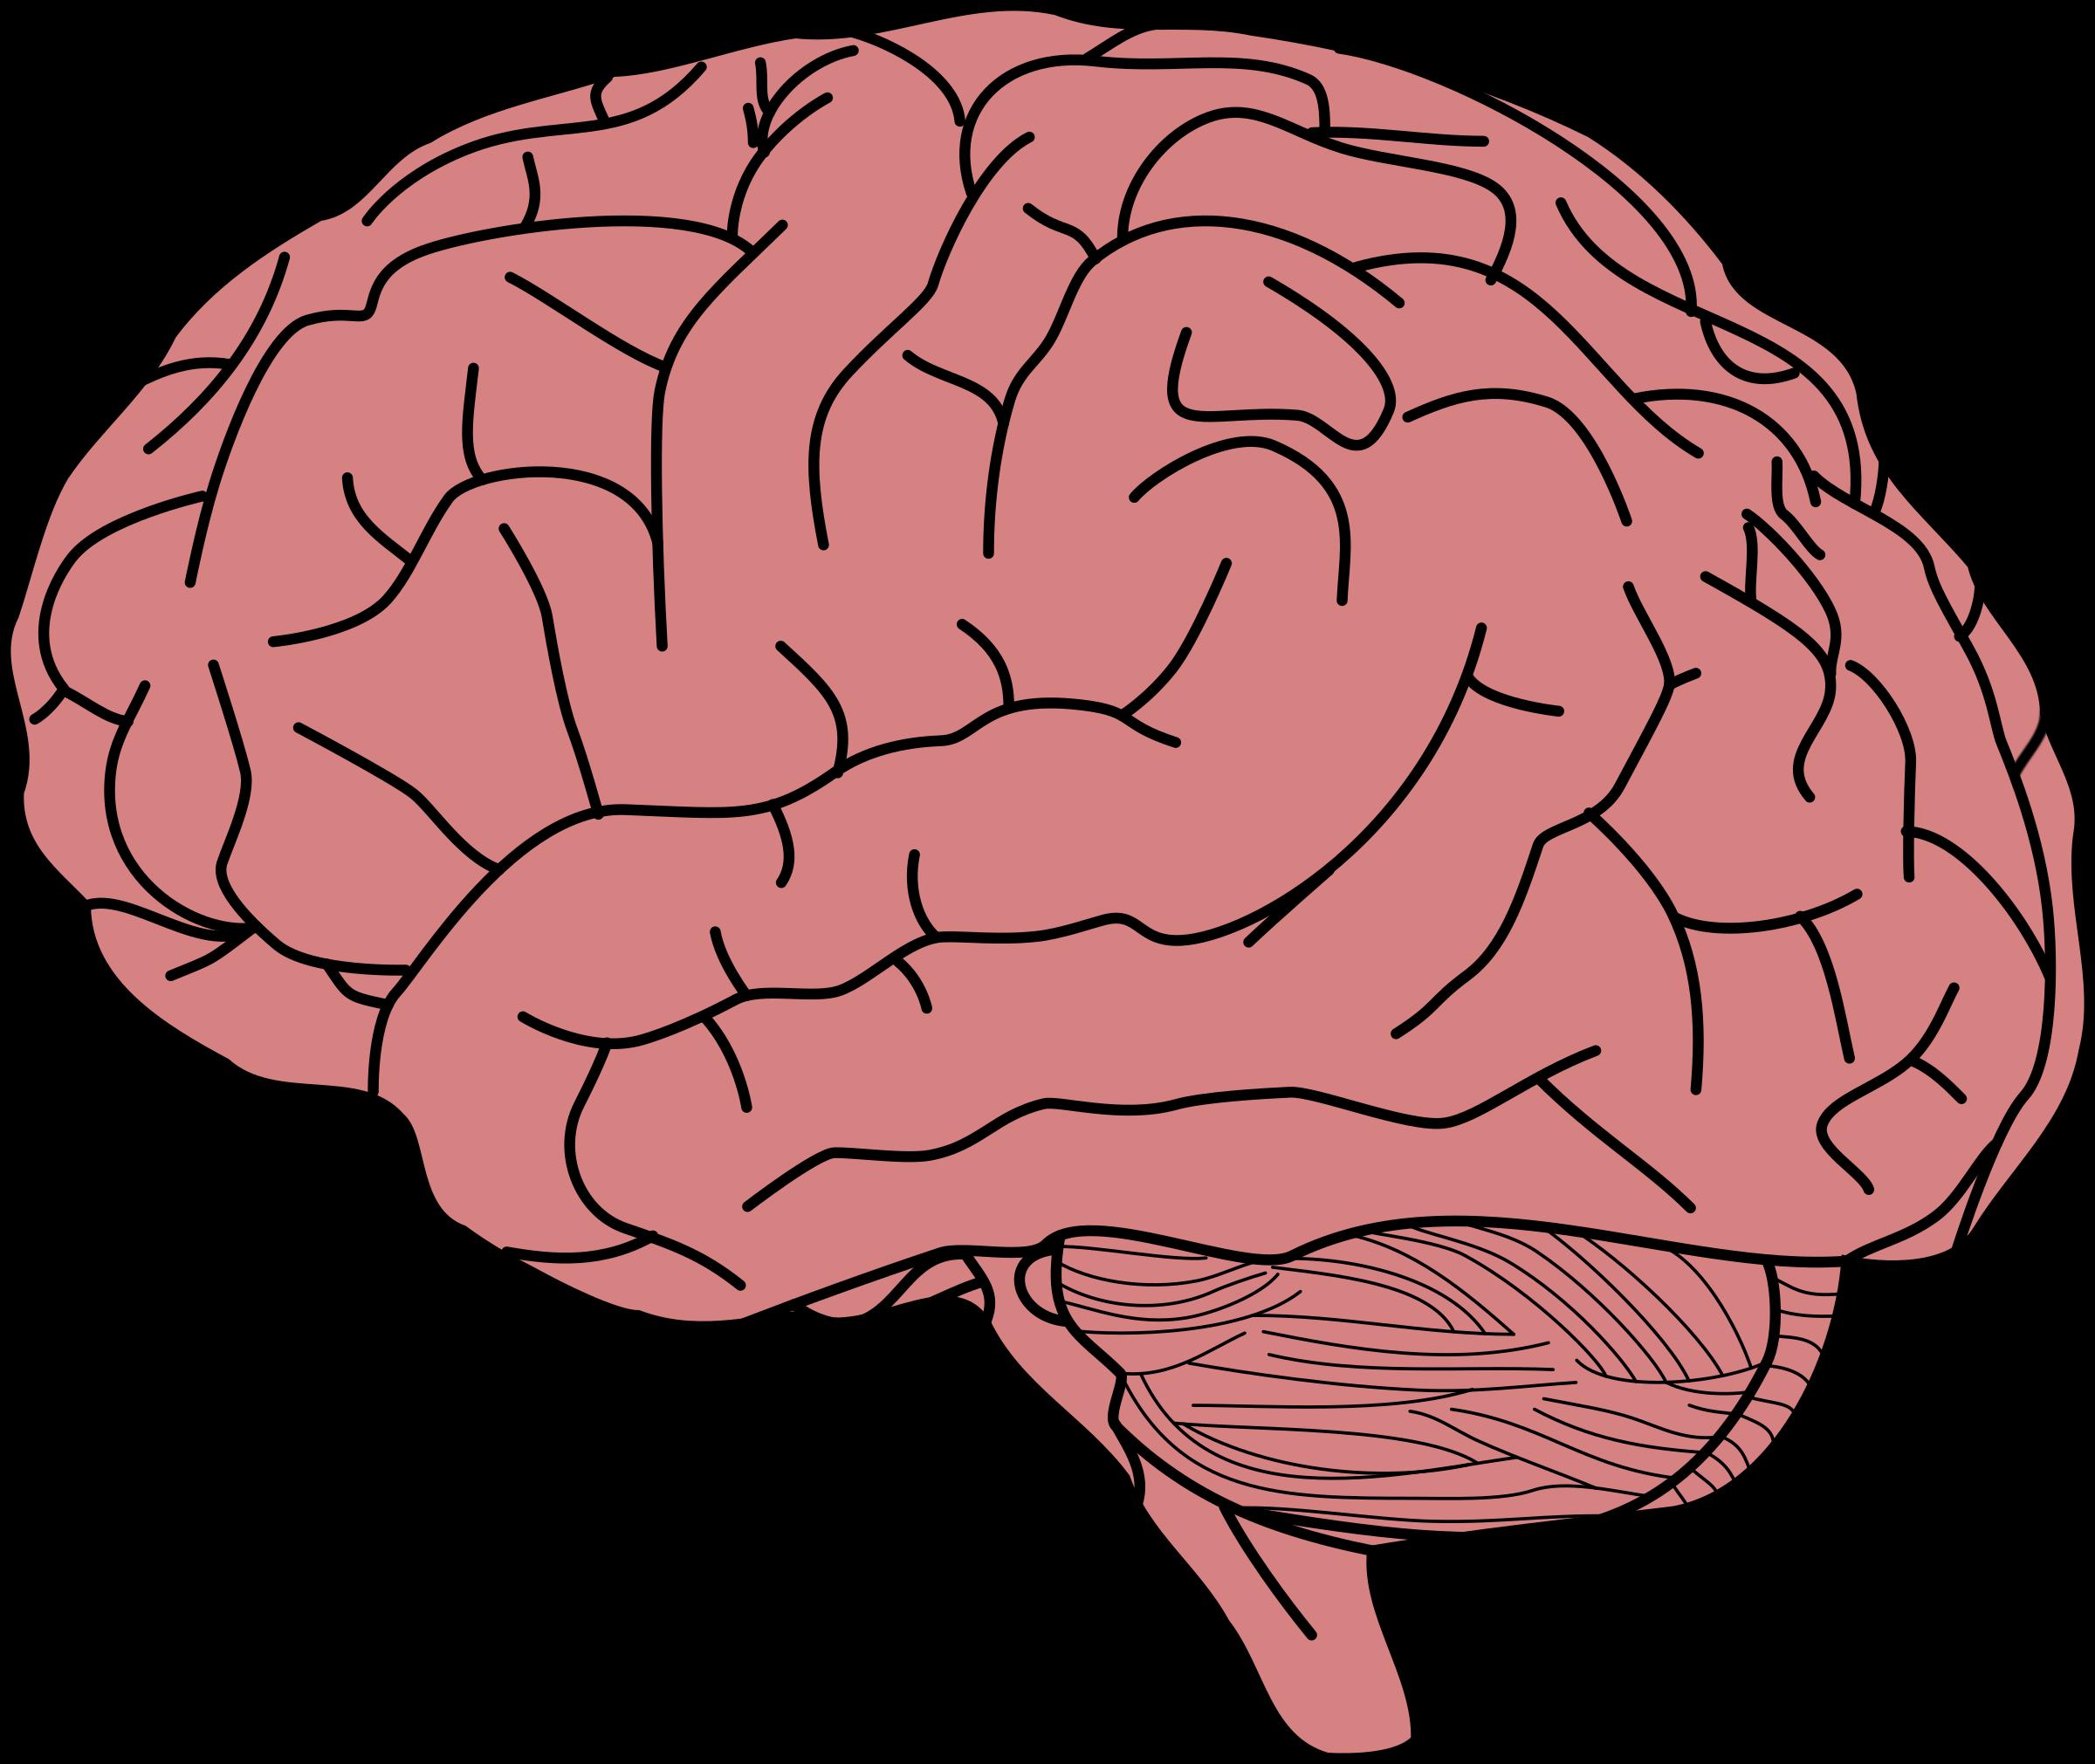 Human brain Memory Clip art.